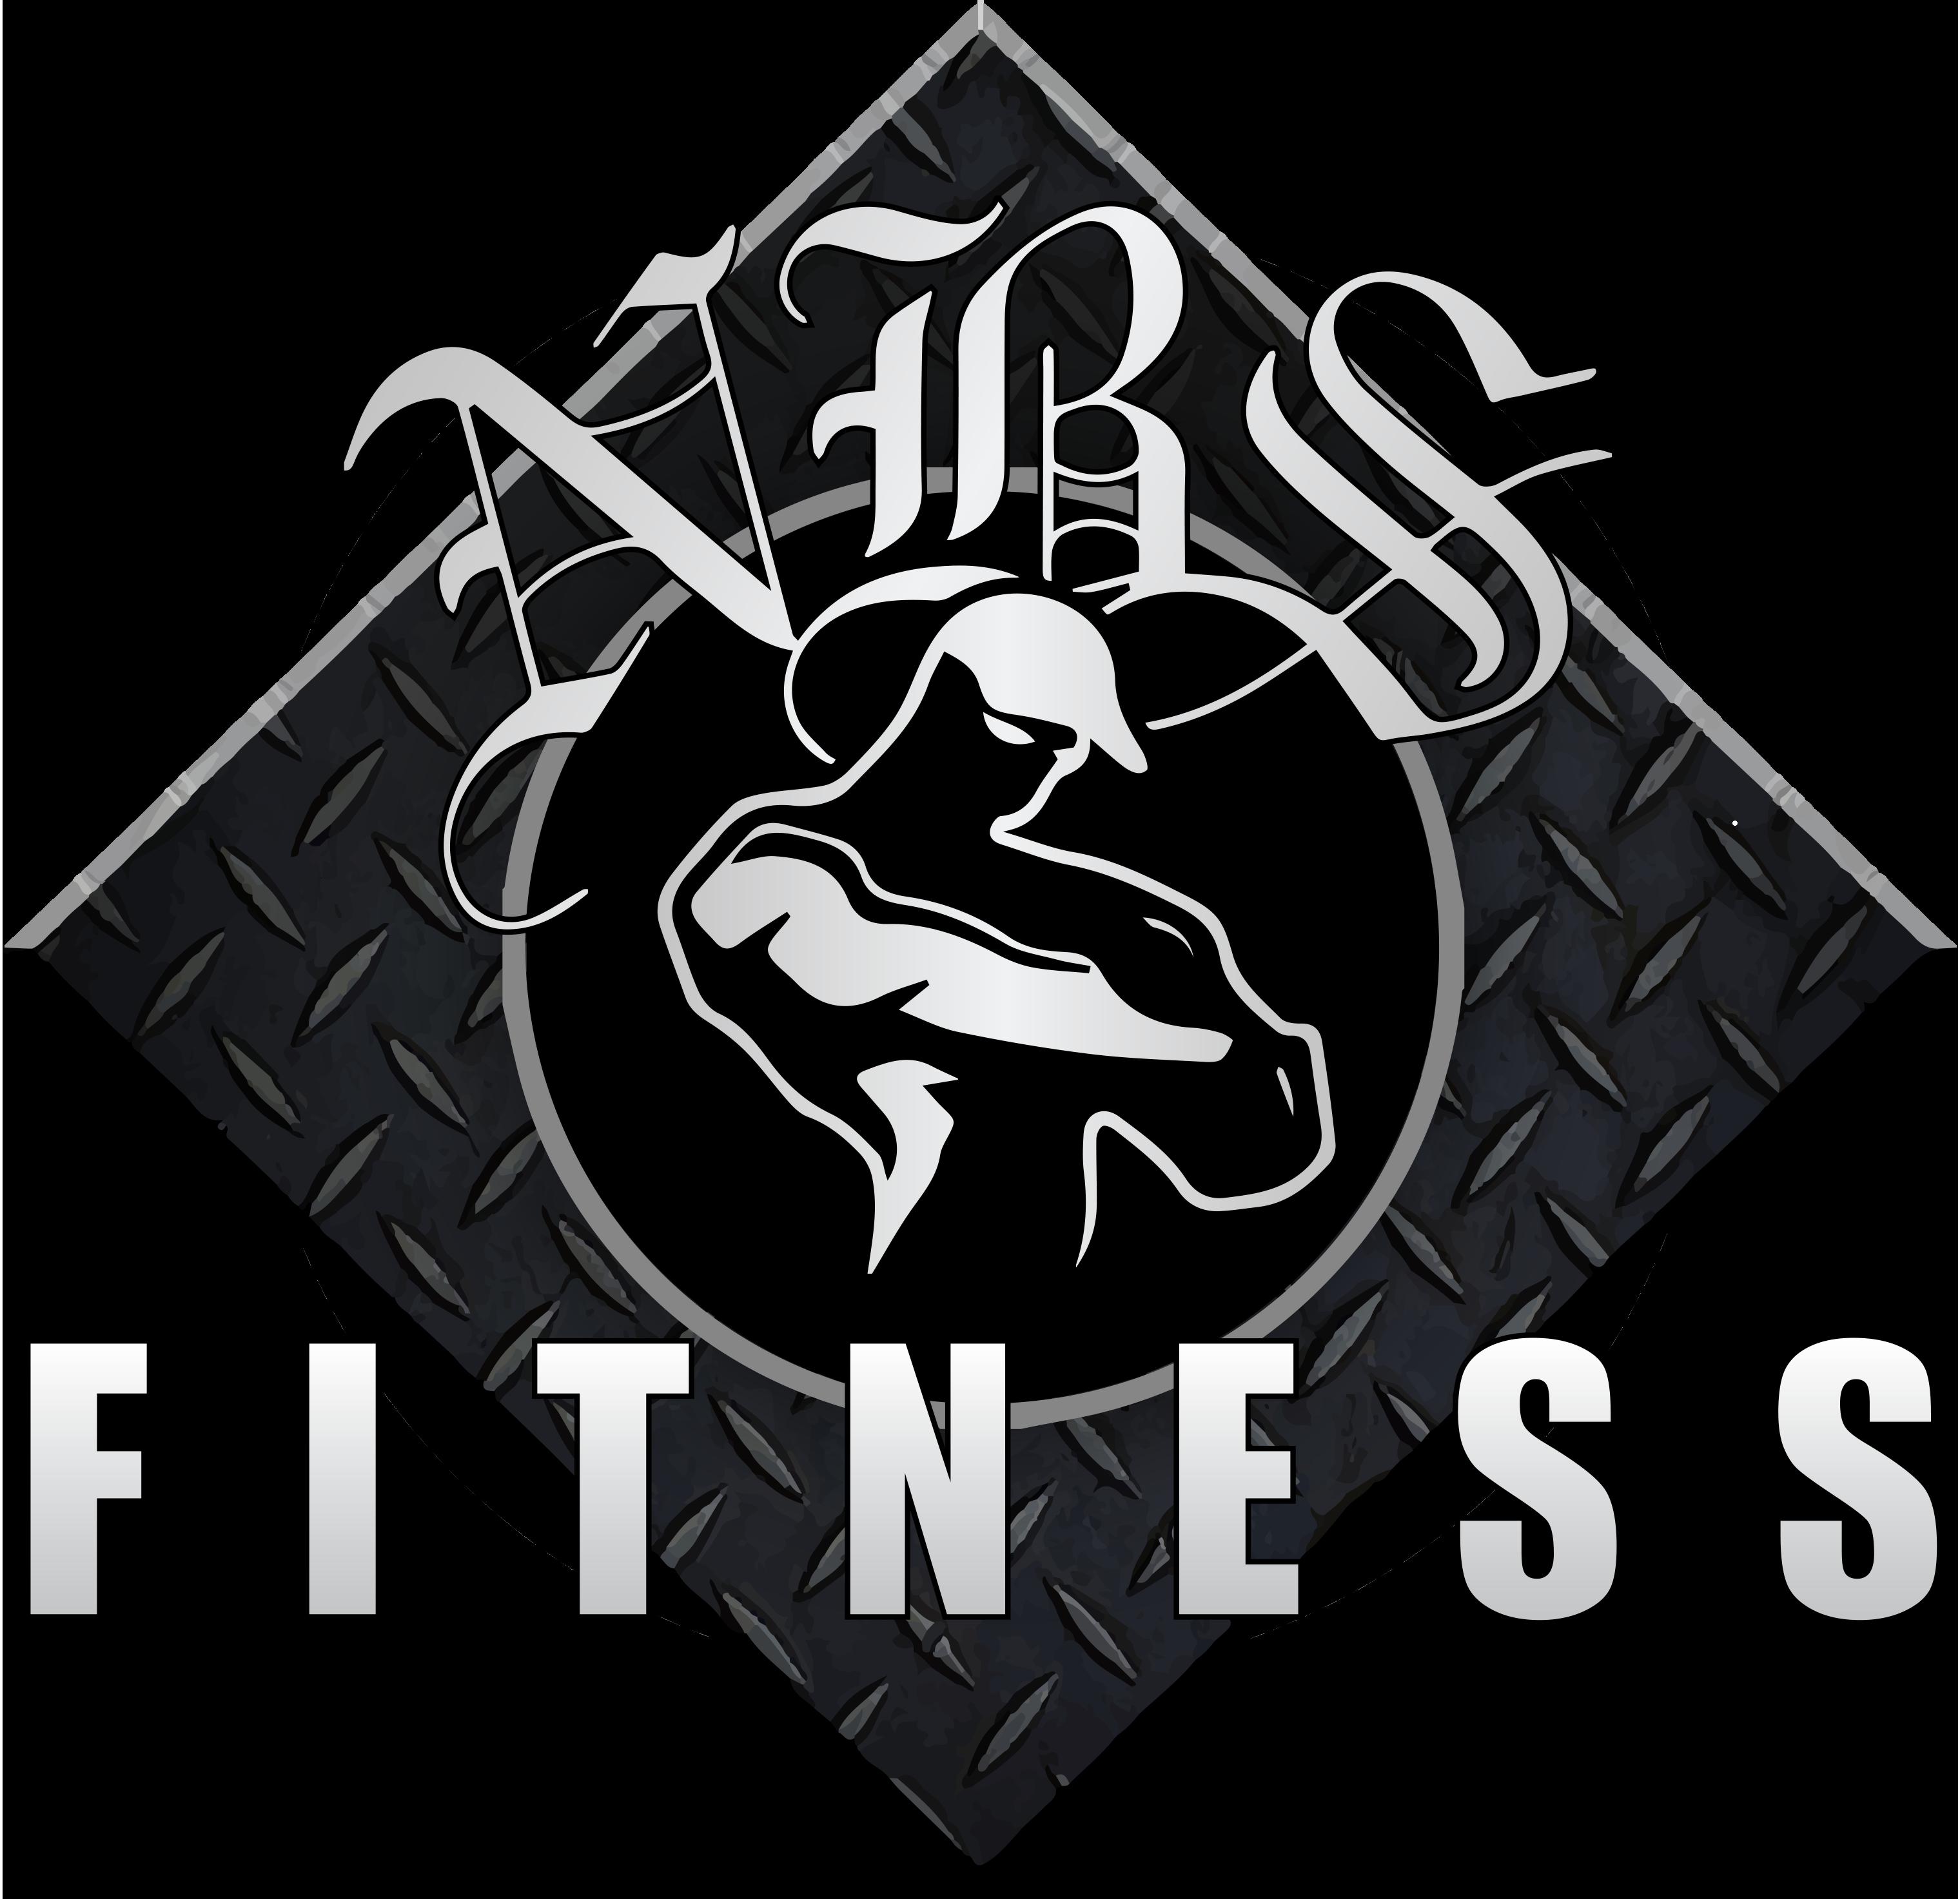 NBS Fitness logo